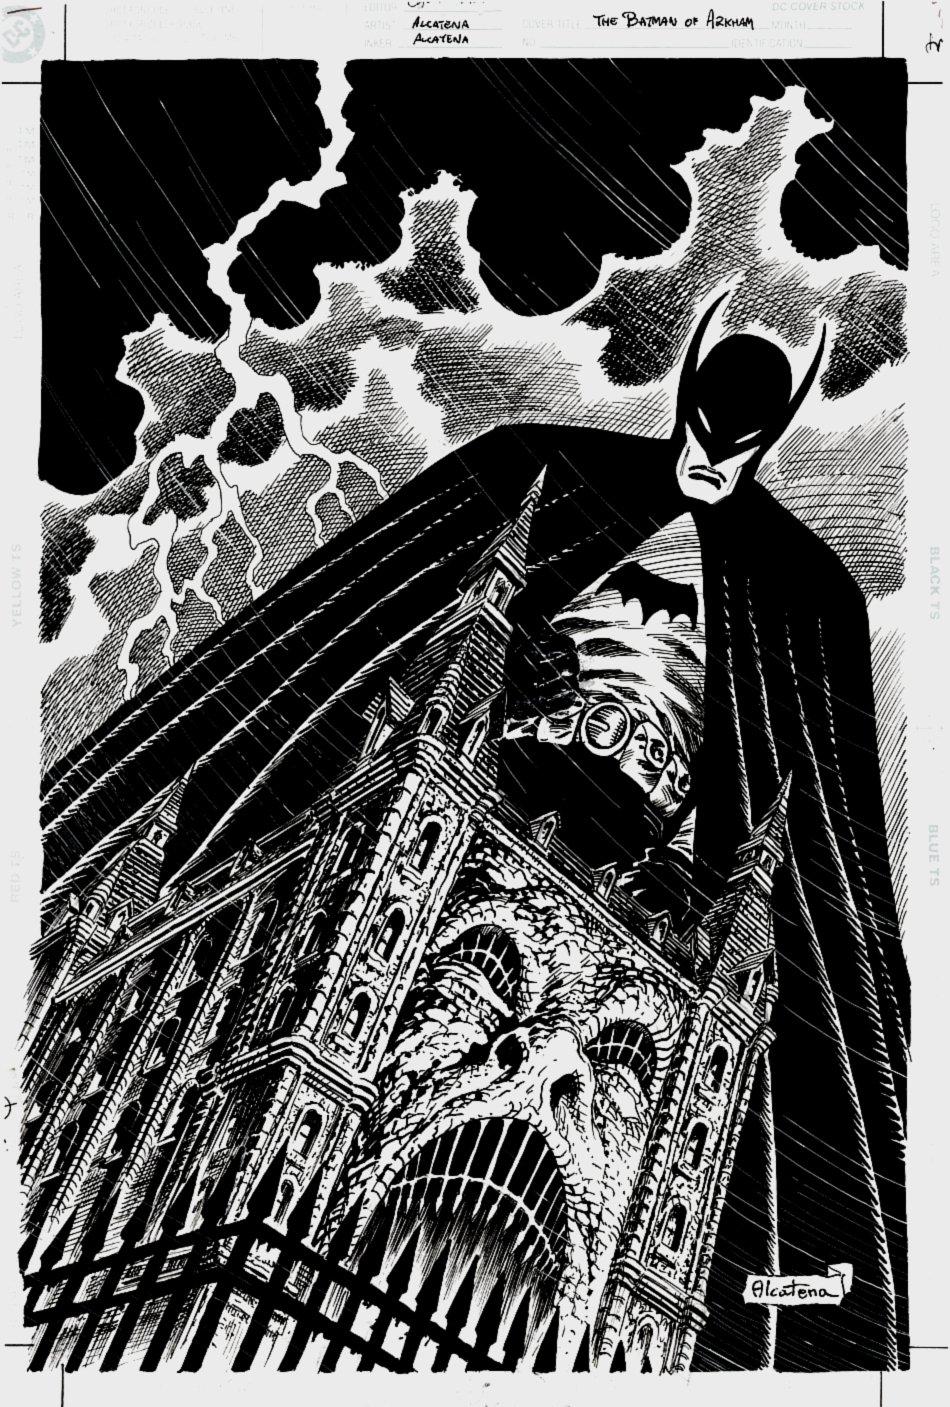 The Batman of Arkham #1 Cover (2000)